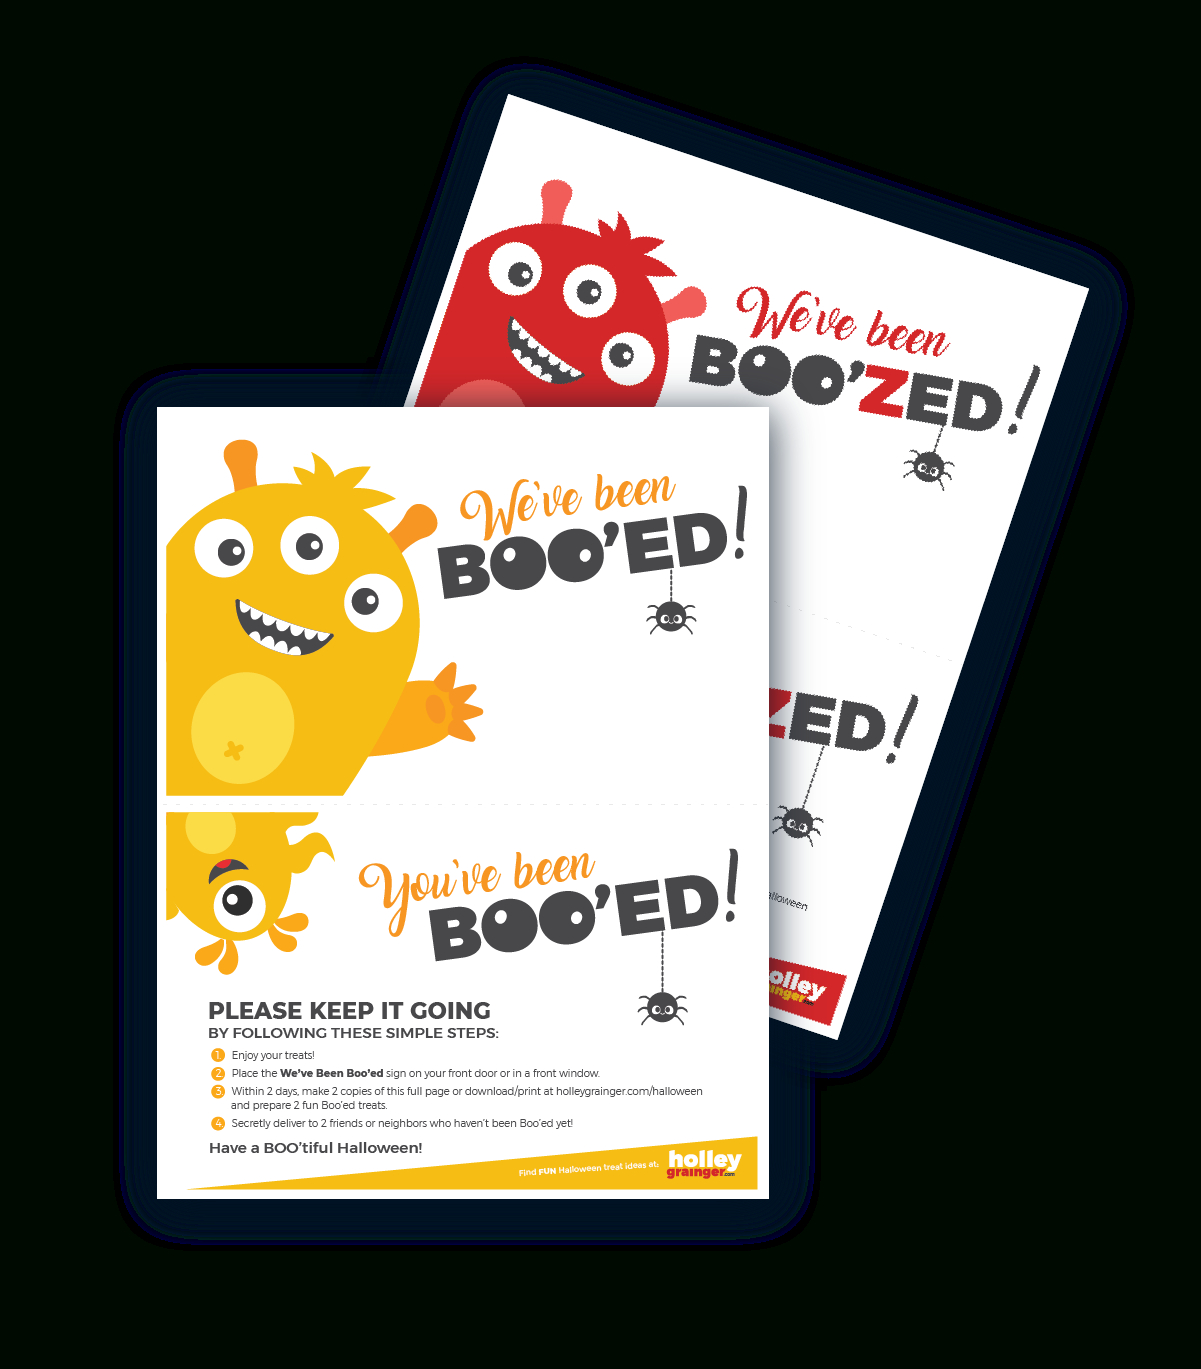 You've Been Boo'zed! Free Halloween Printable   Holley Grainger - You Ve Been Boozed Free Printable